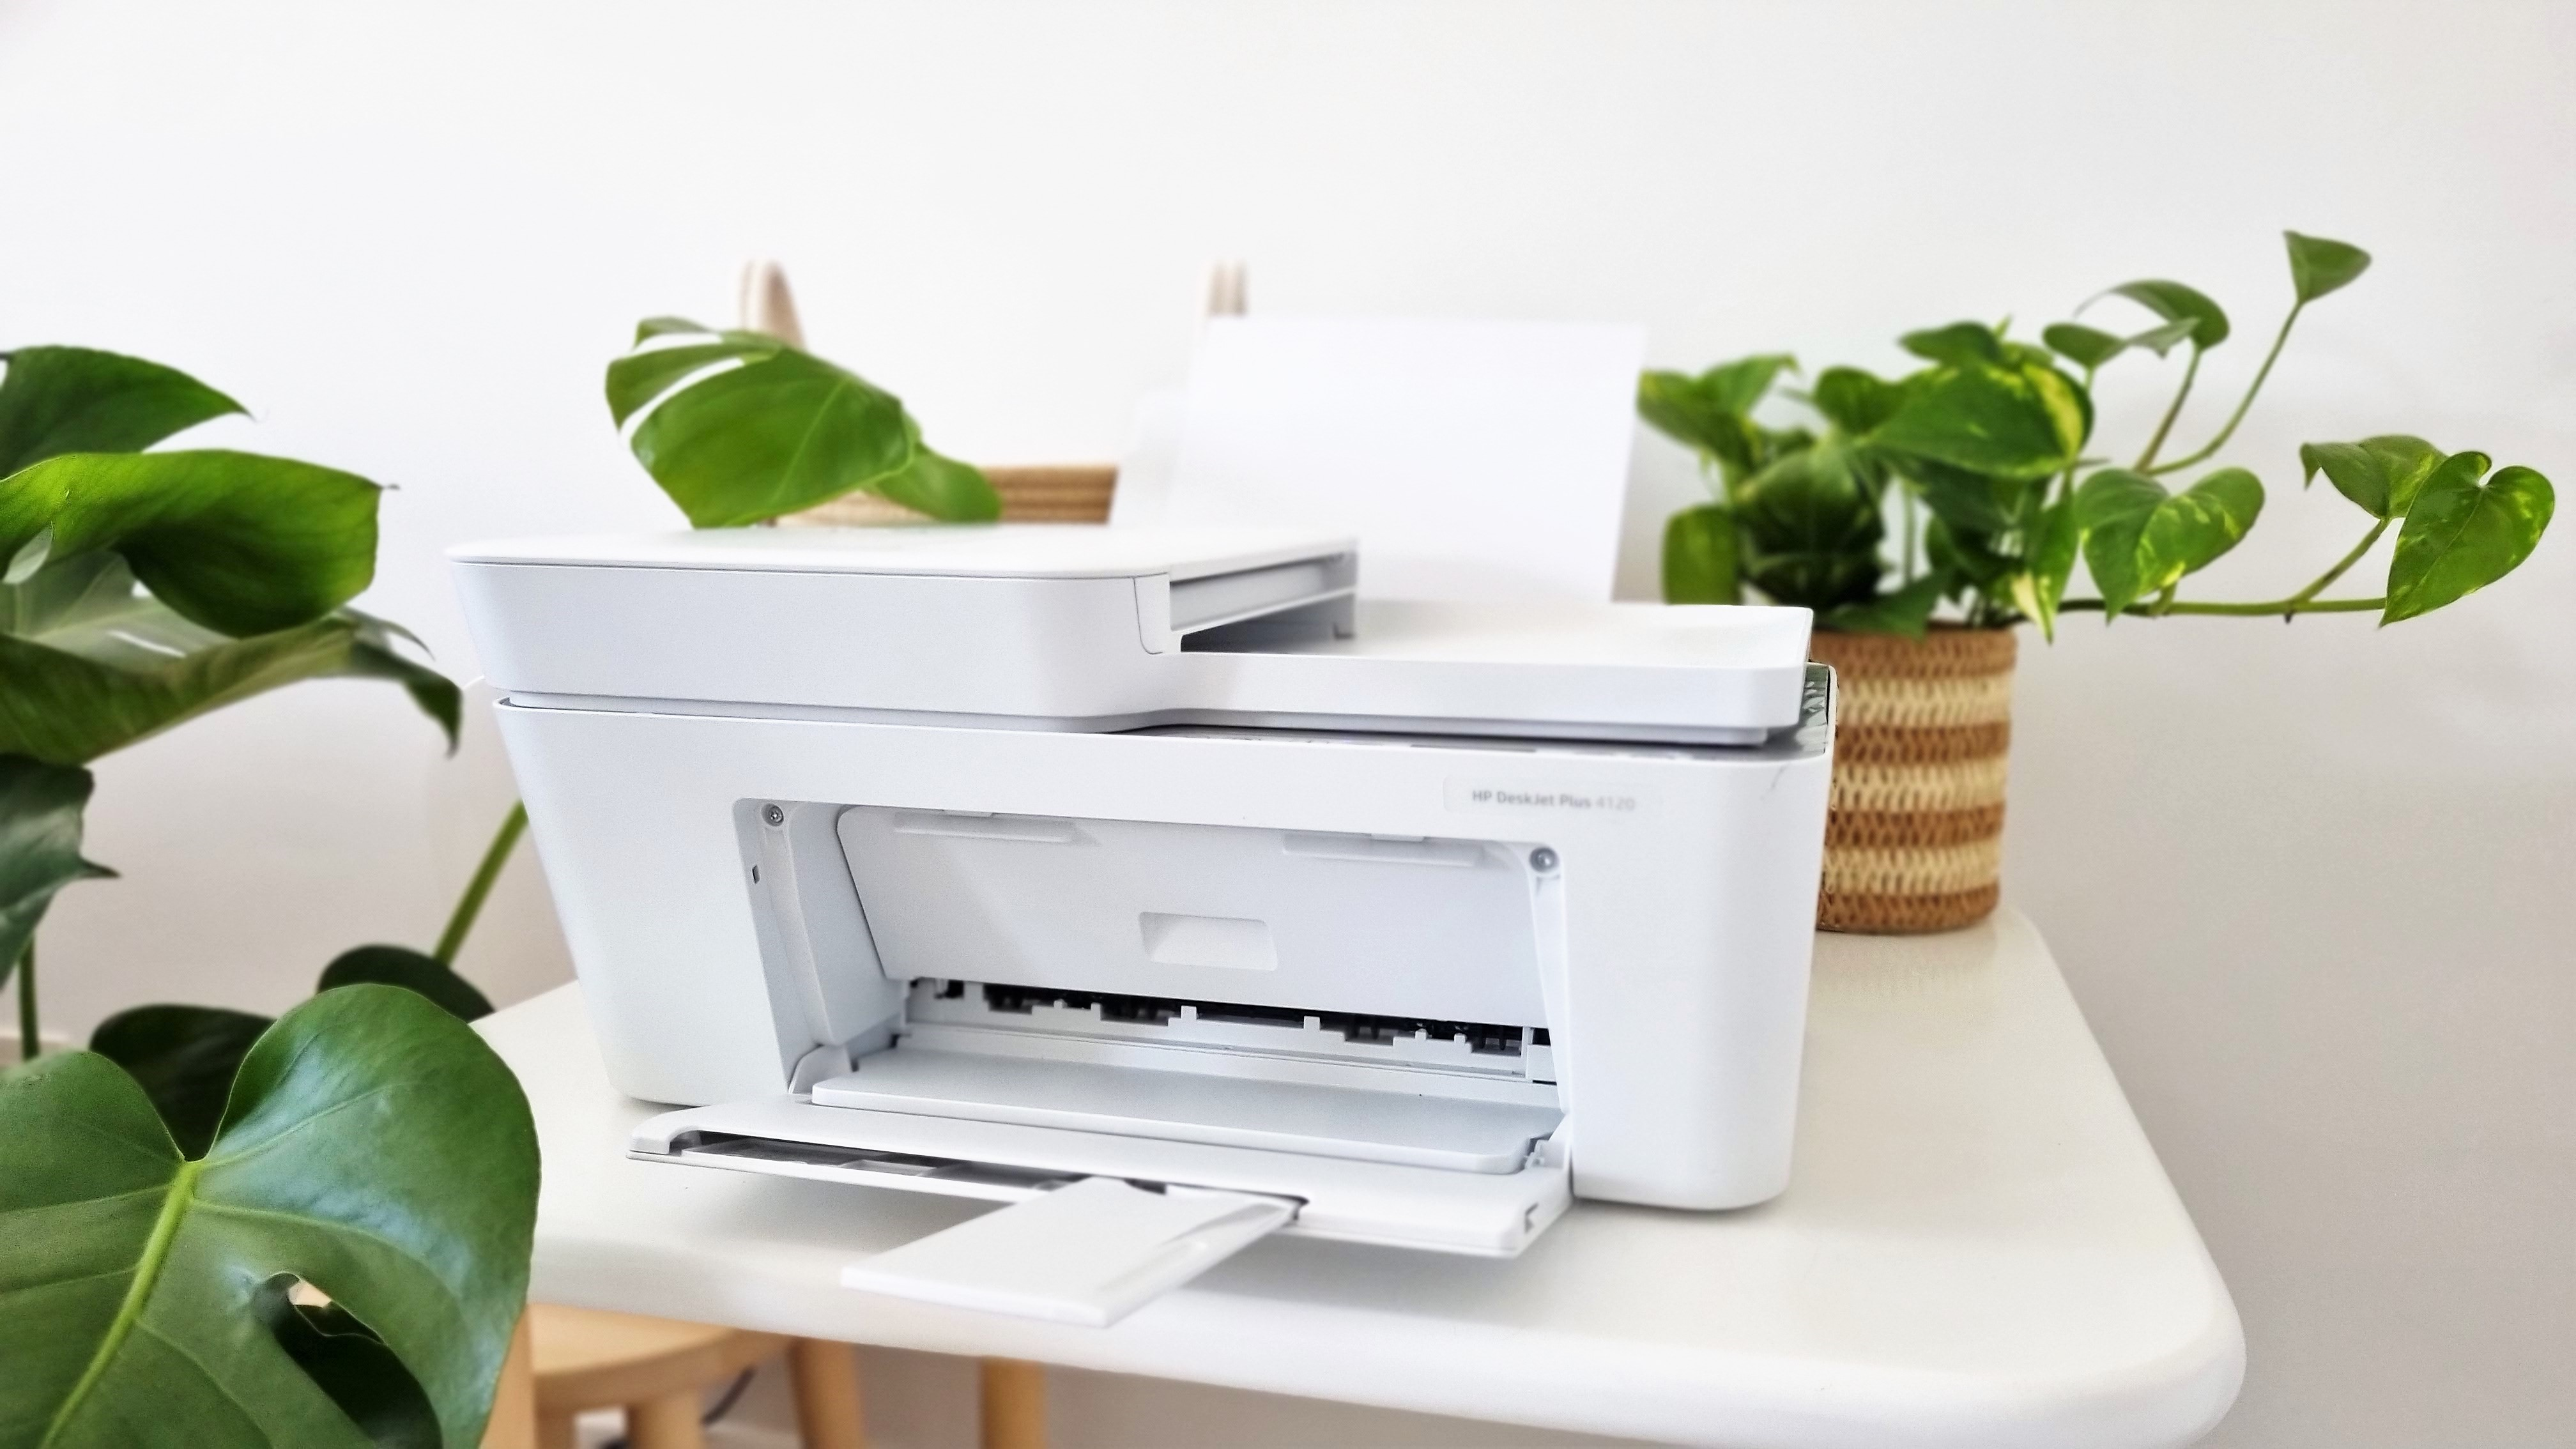 imprimanta hp abonament instant ink